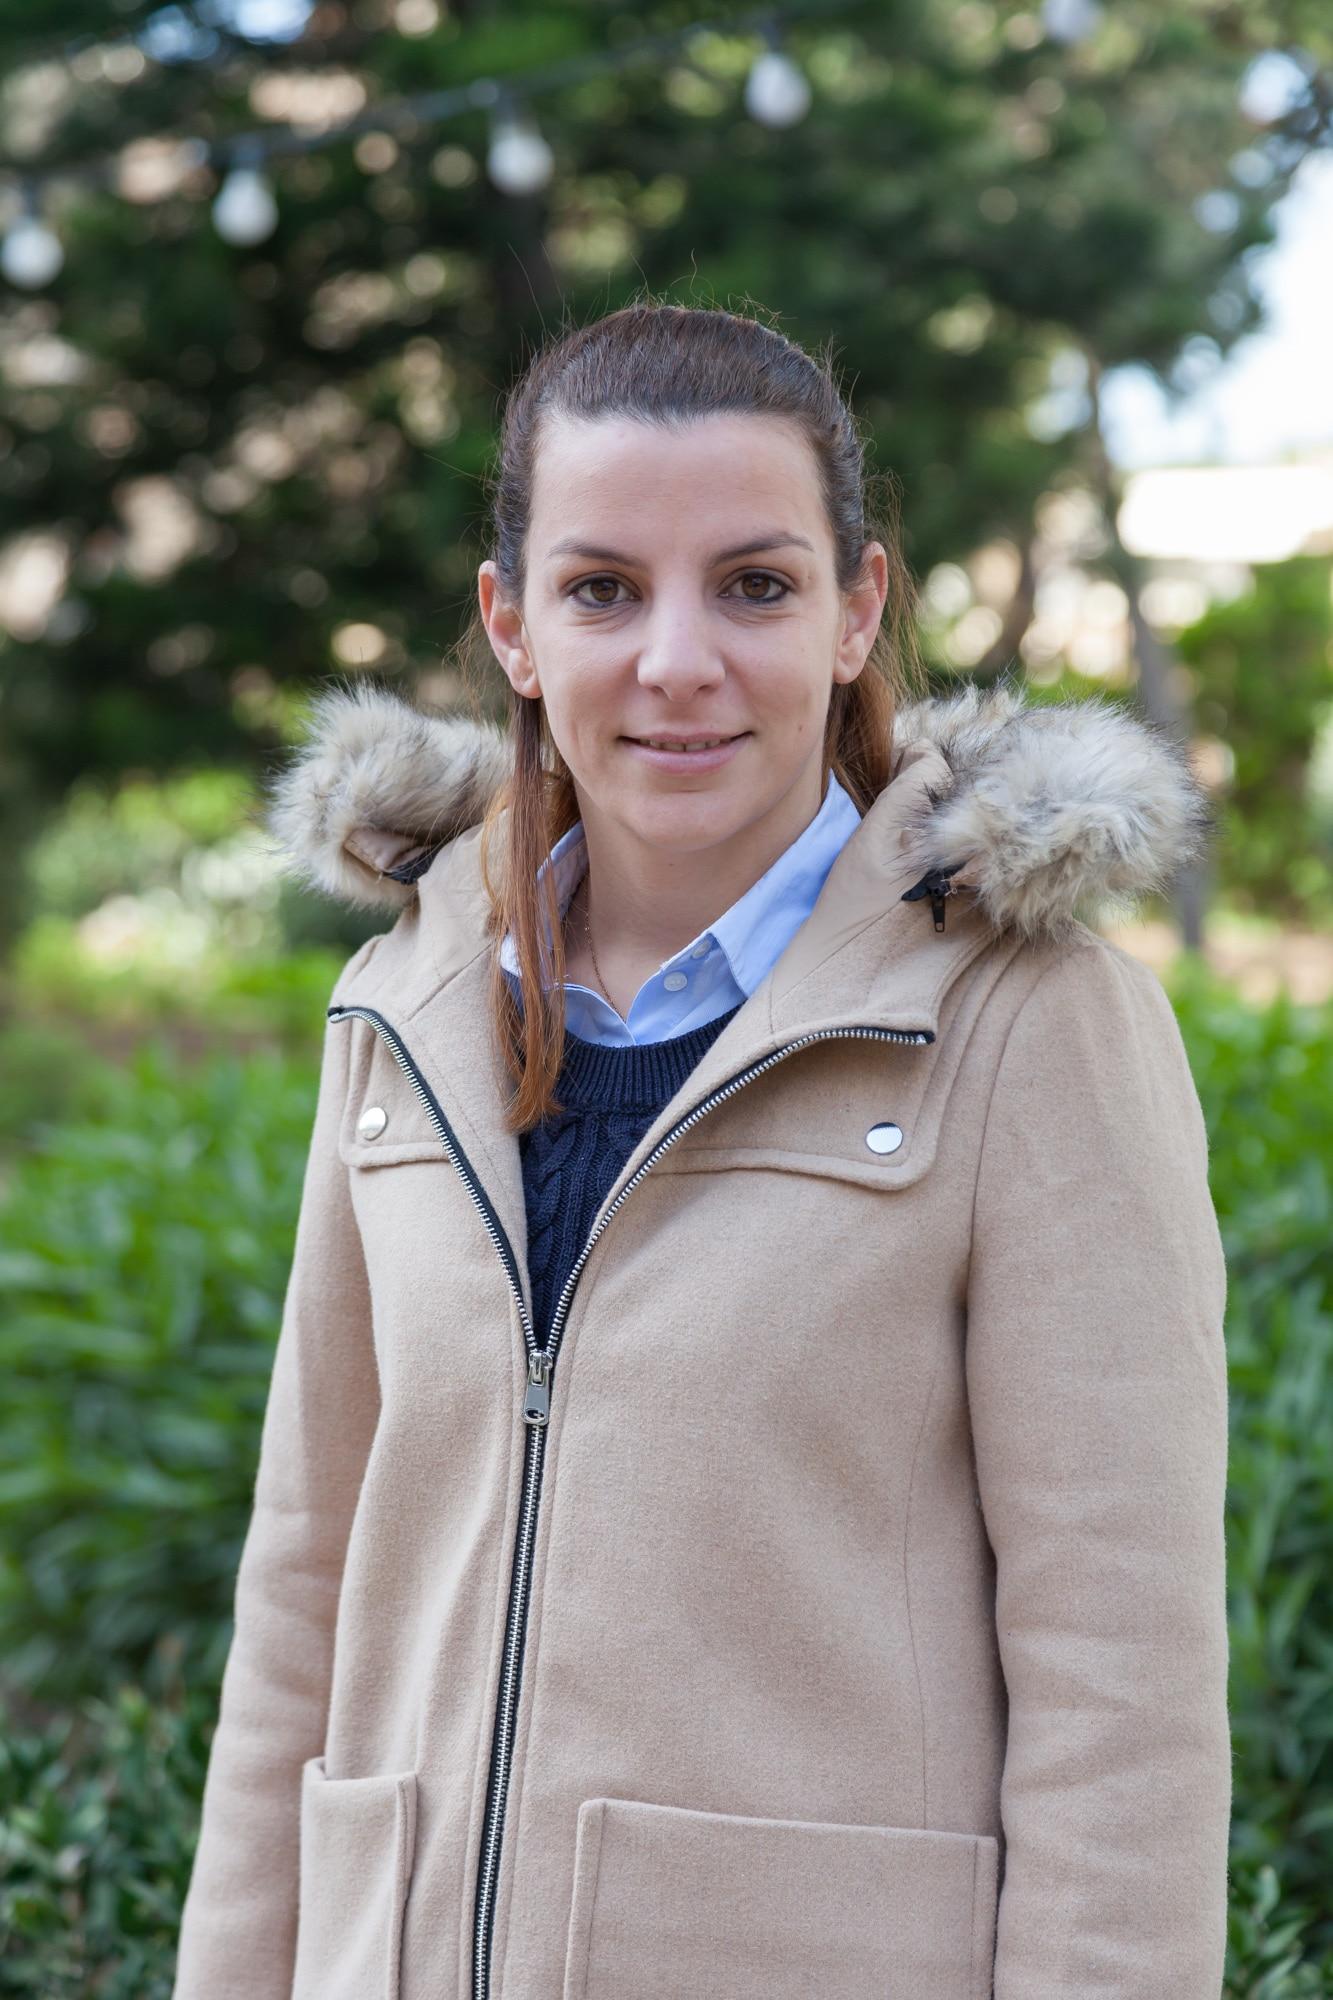 Ms Annalise Domenici